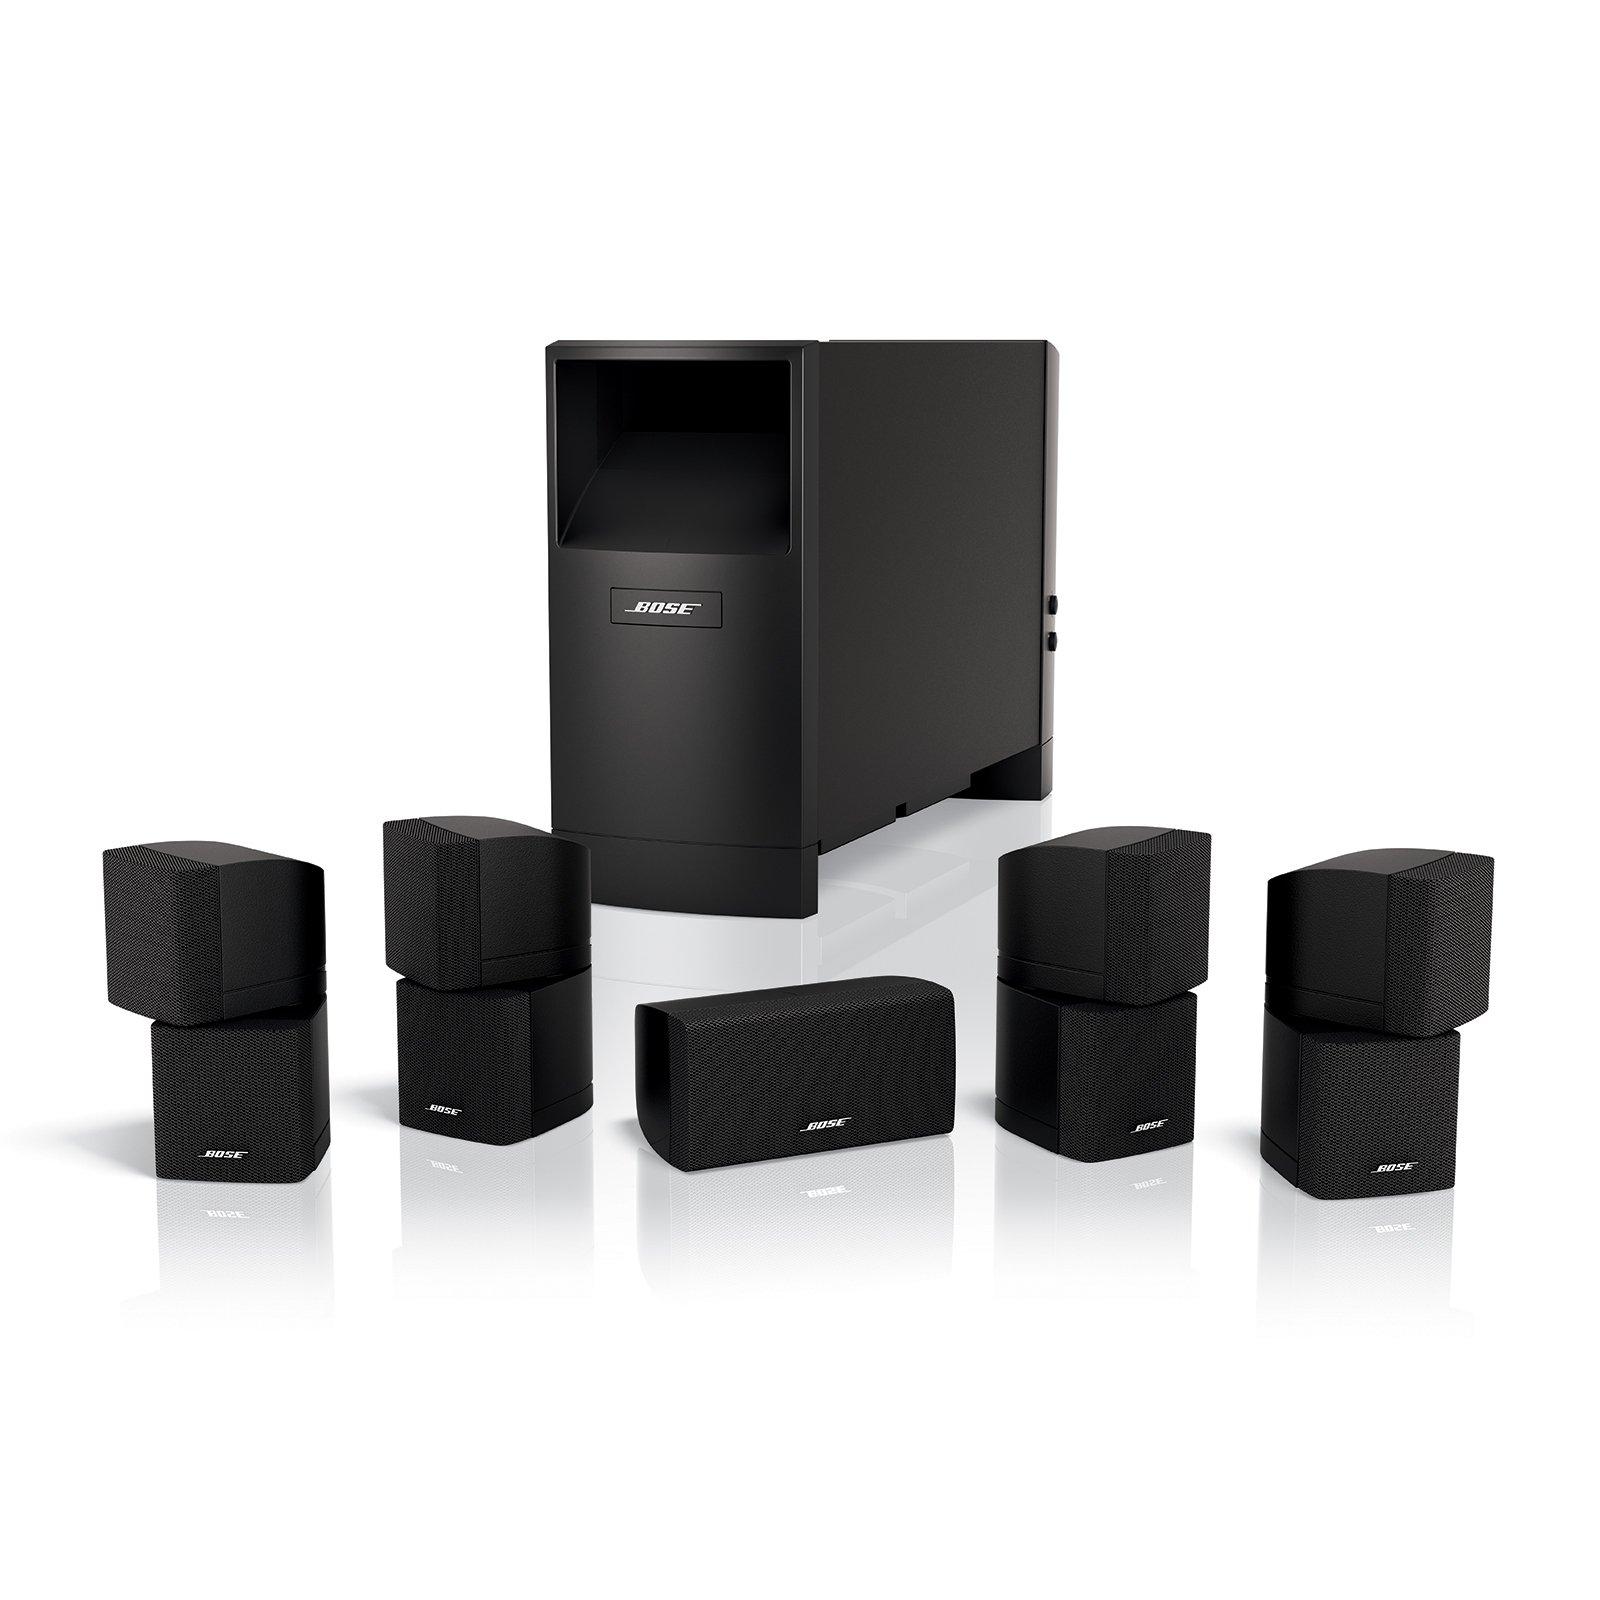 Bose Acoustimass 10 Series IV Home Entertainment Speaker System (Black)